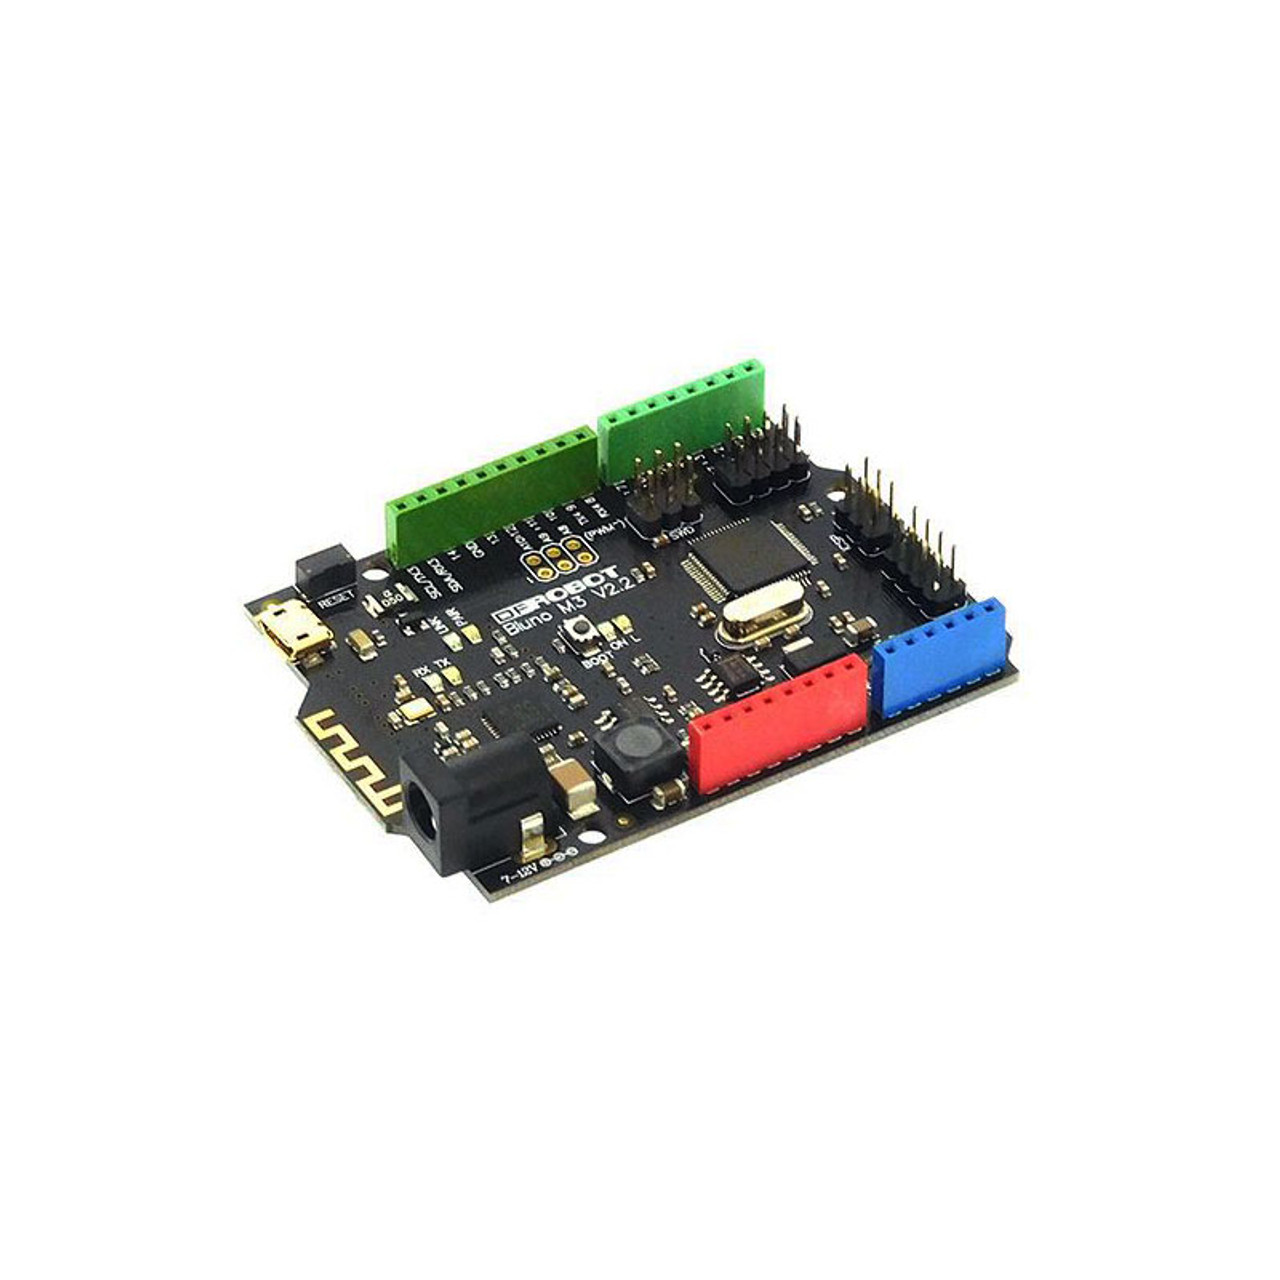 DFR0329 - Bluno M3 - A STM32 ARM with Bluetooth 4 0